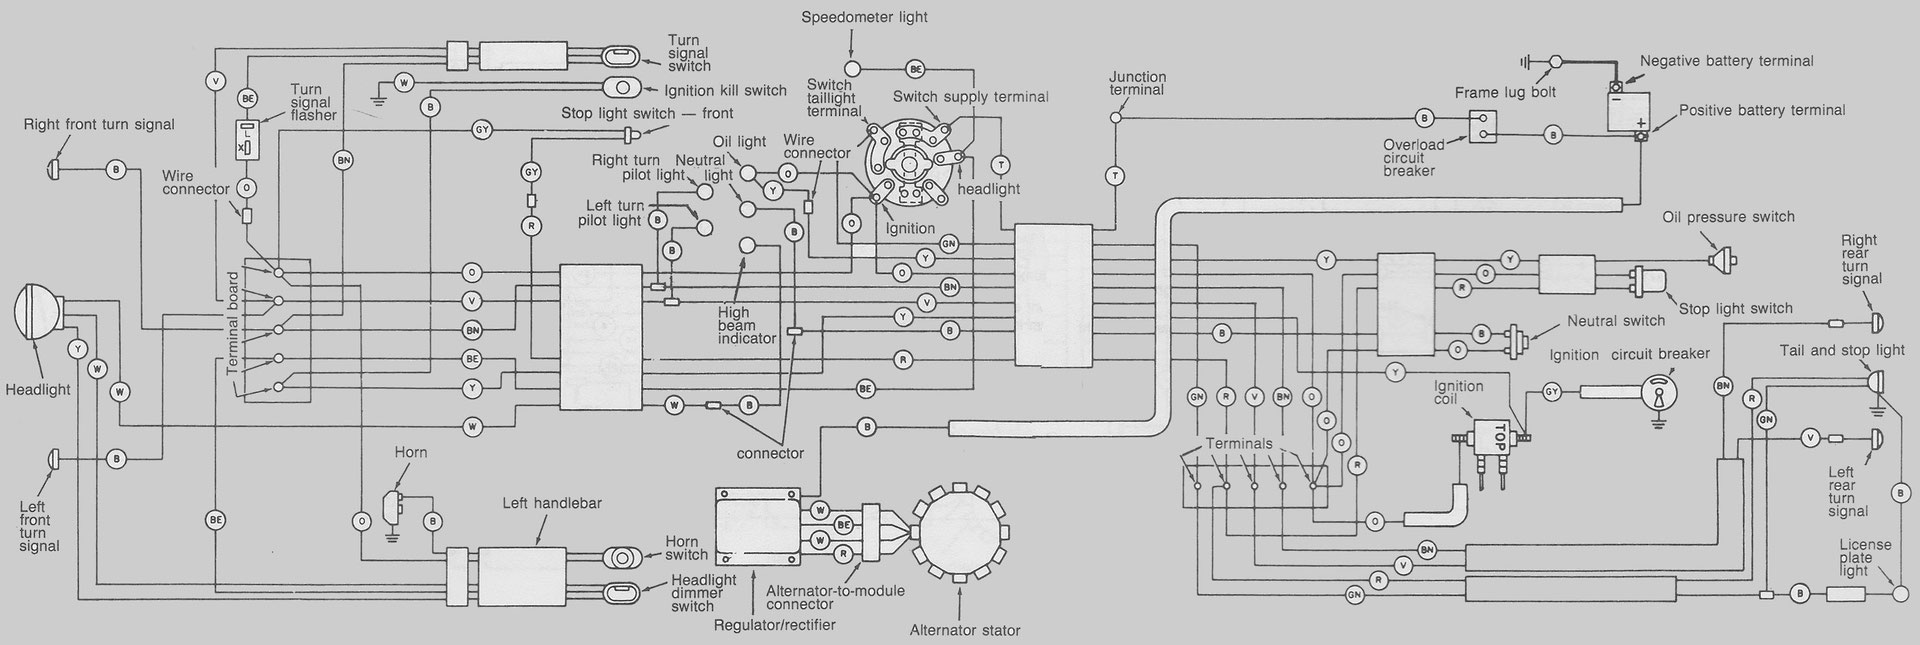 Harley Davidson Fx Wiring Diagrams